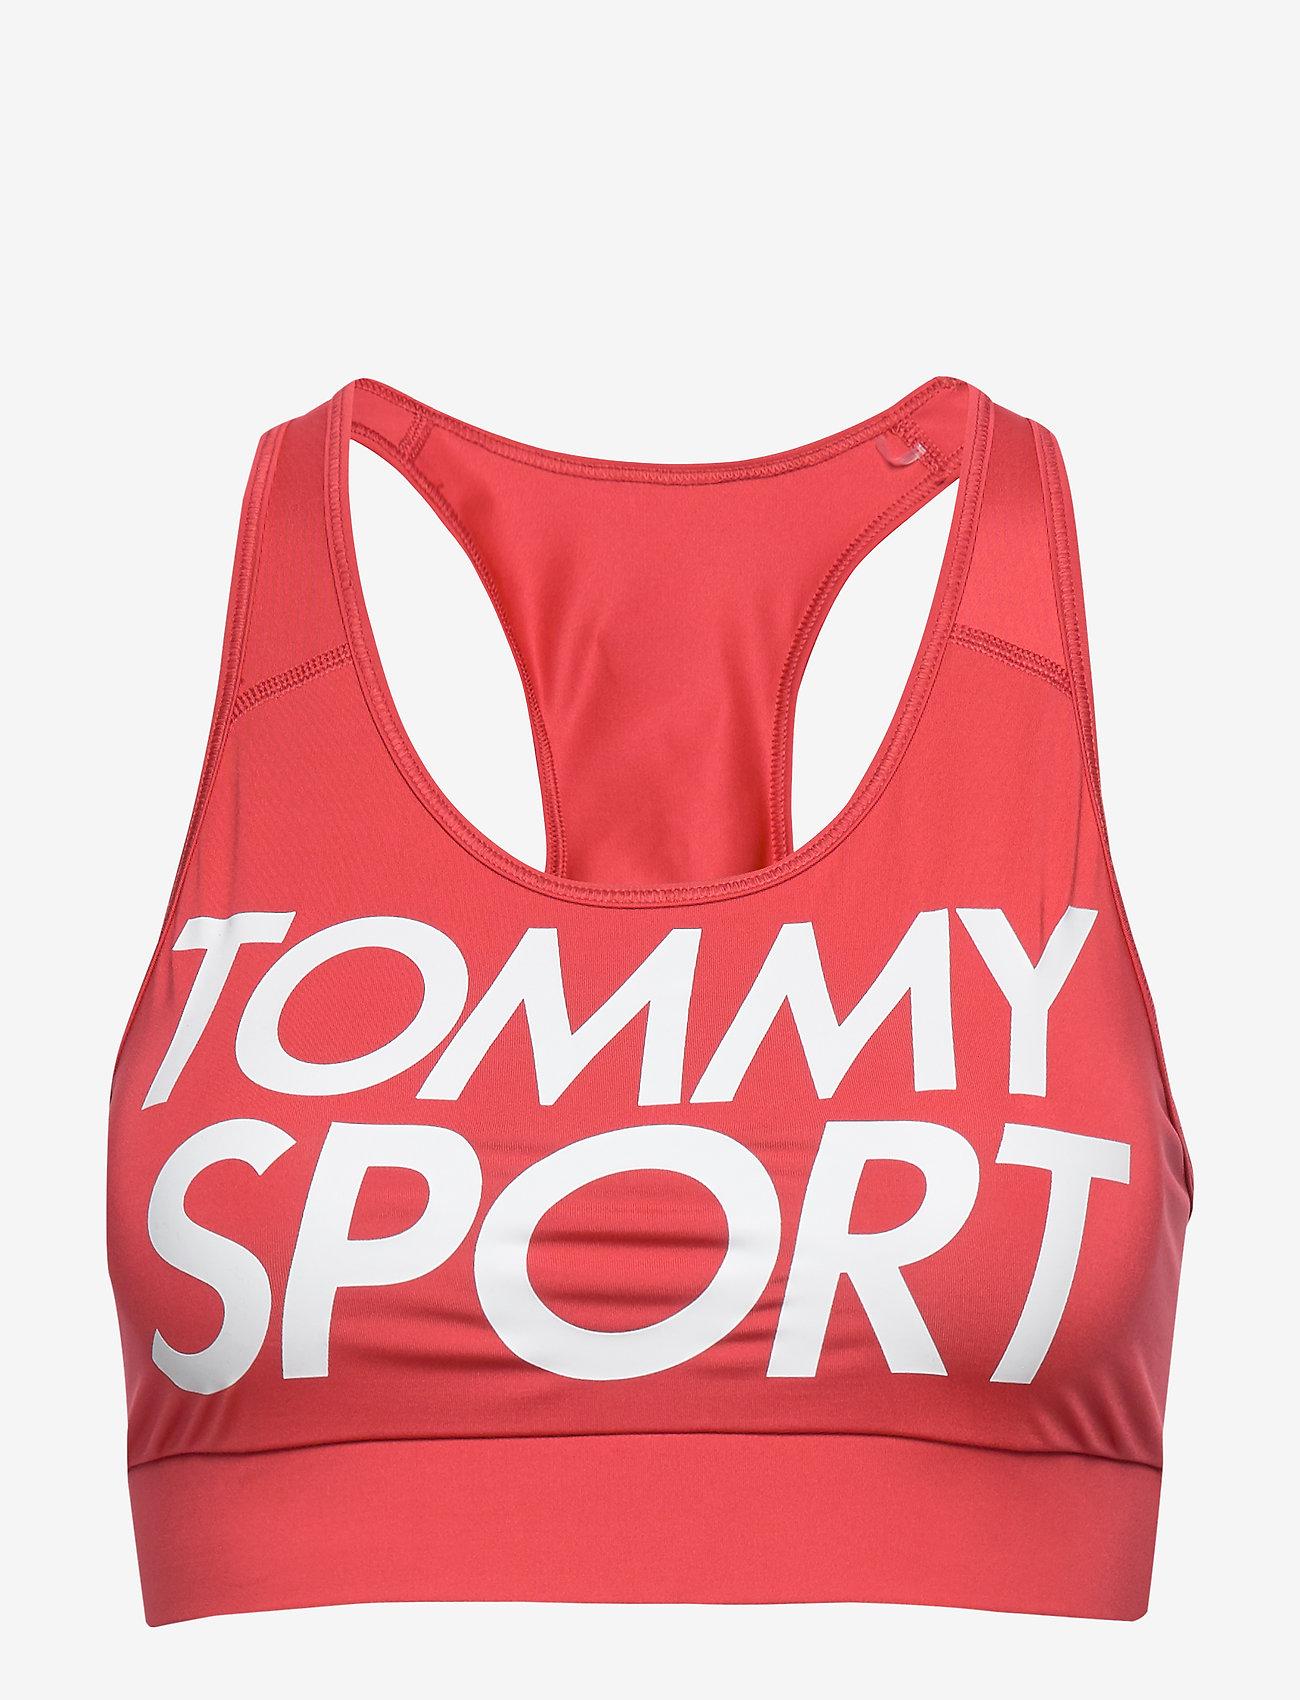 Tommy Sport - SPORTS BRA LOGO MID - sport bras: low - cardinal - 0